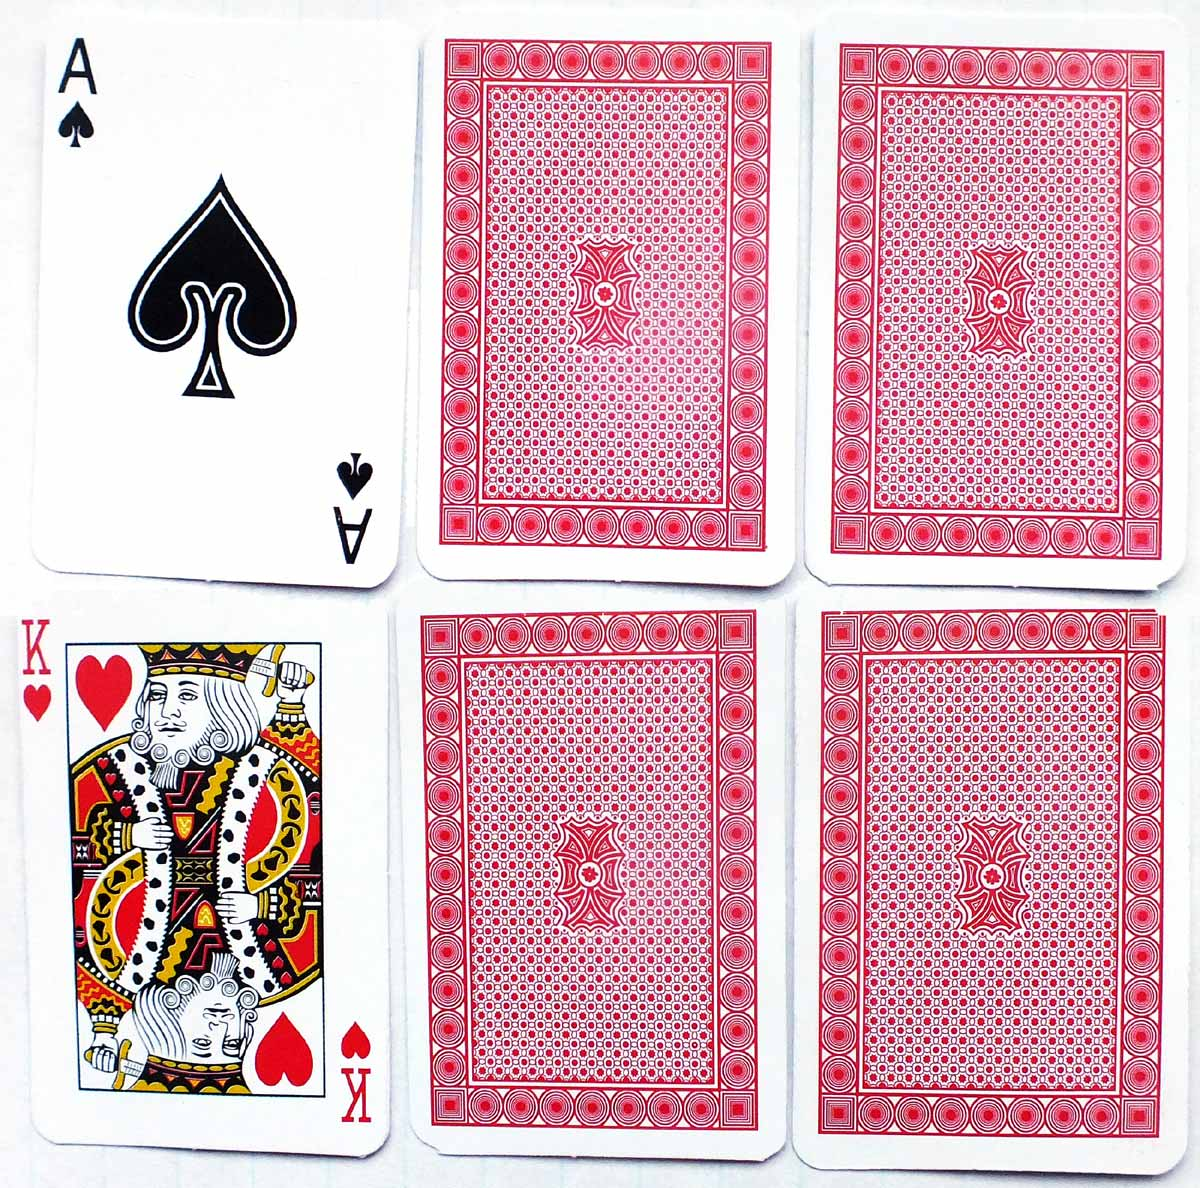 """Magic Poker Cards"" found inside Christmas cracker, 2018"